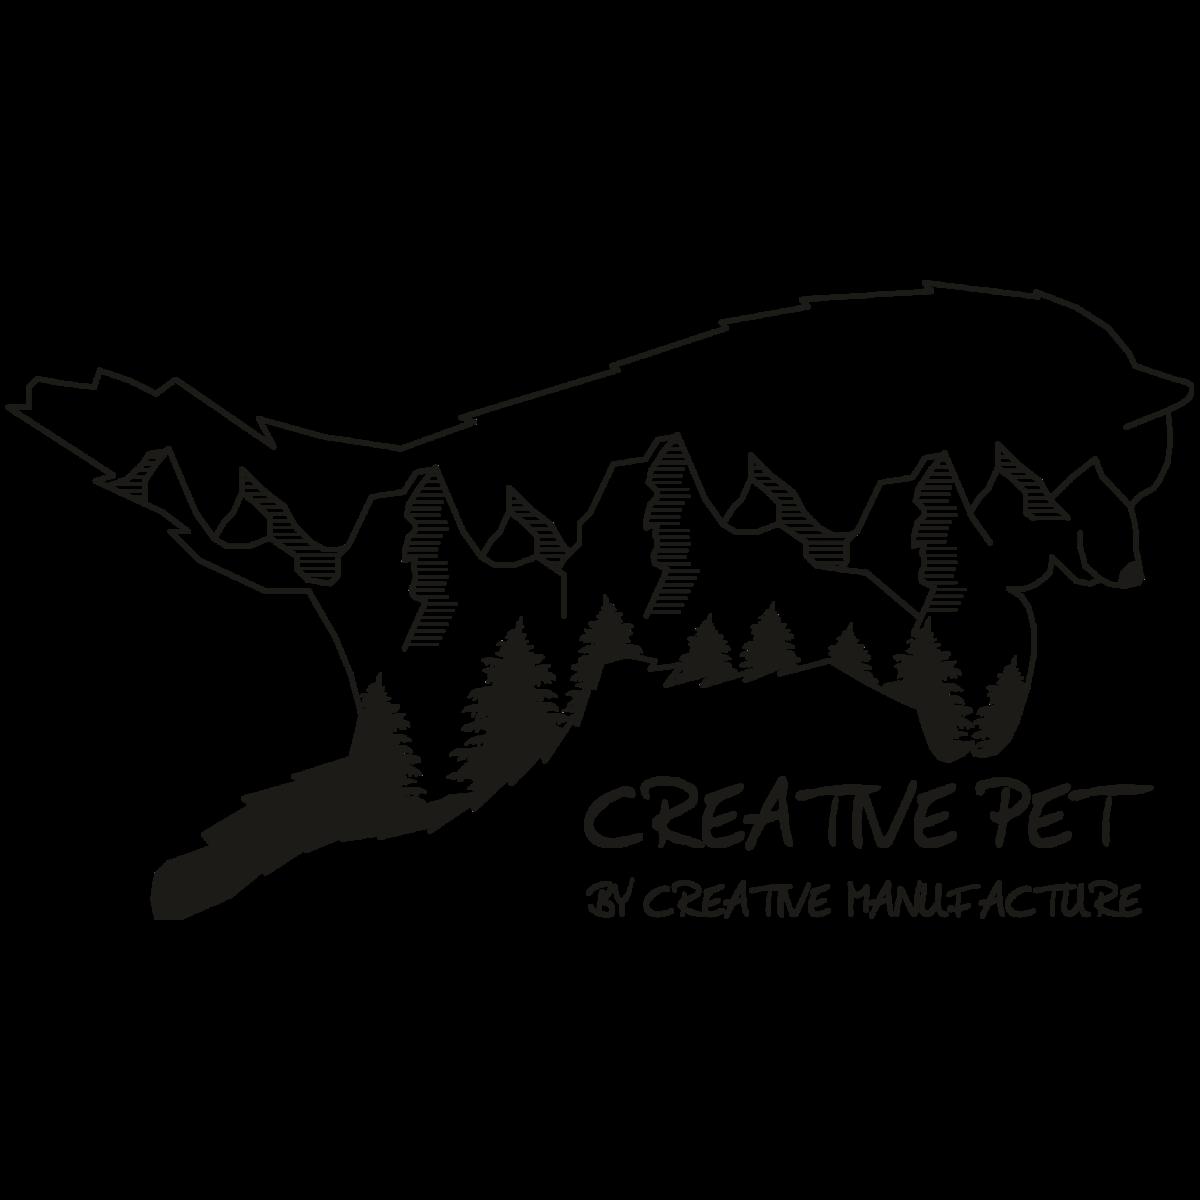 CREATIVE PET